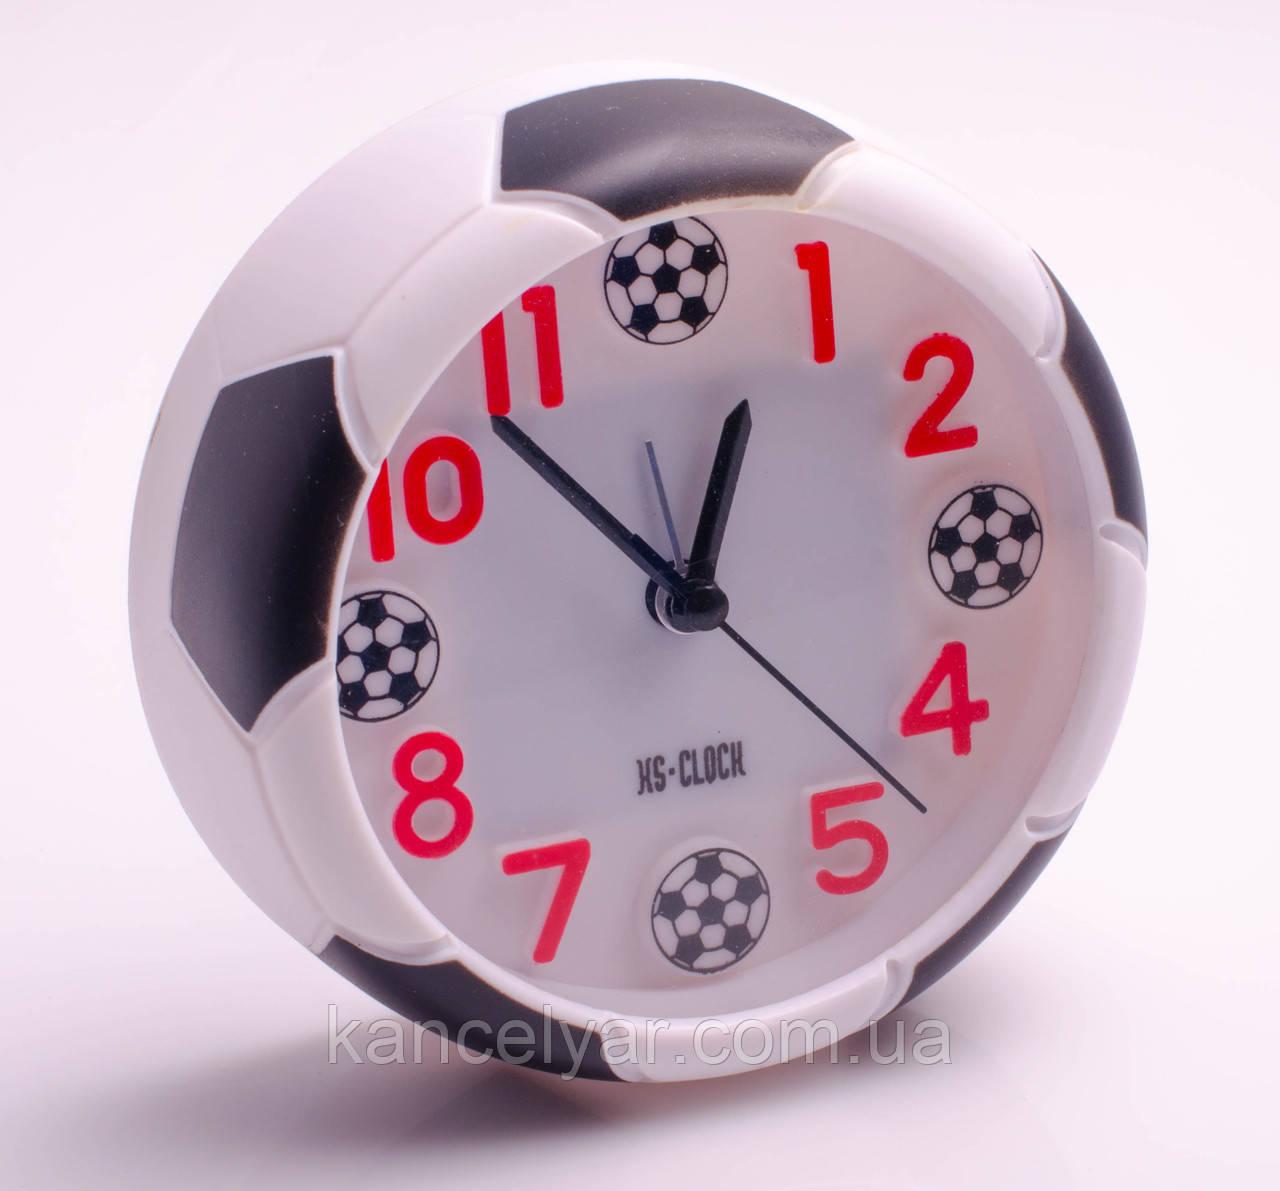 Годинник-будильник, в асортименті